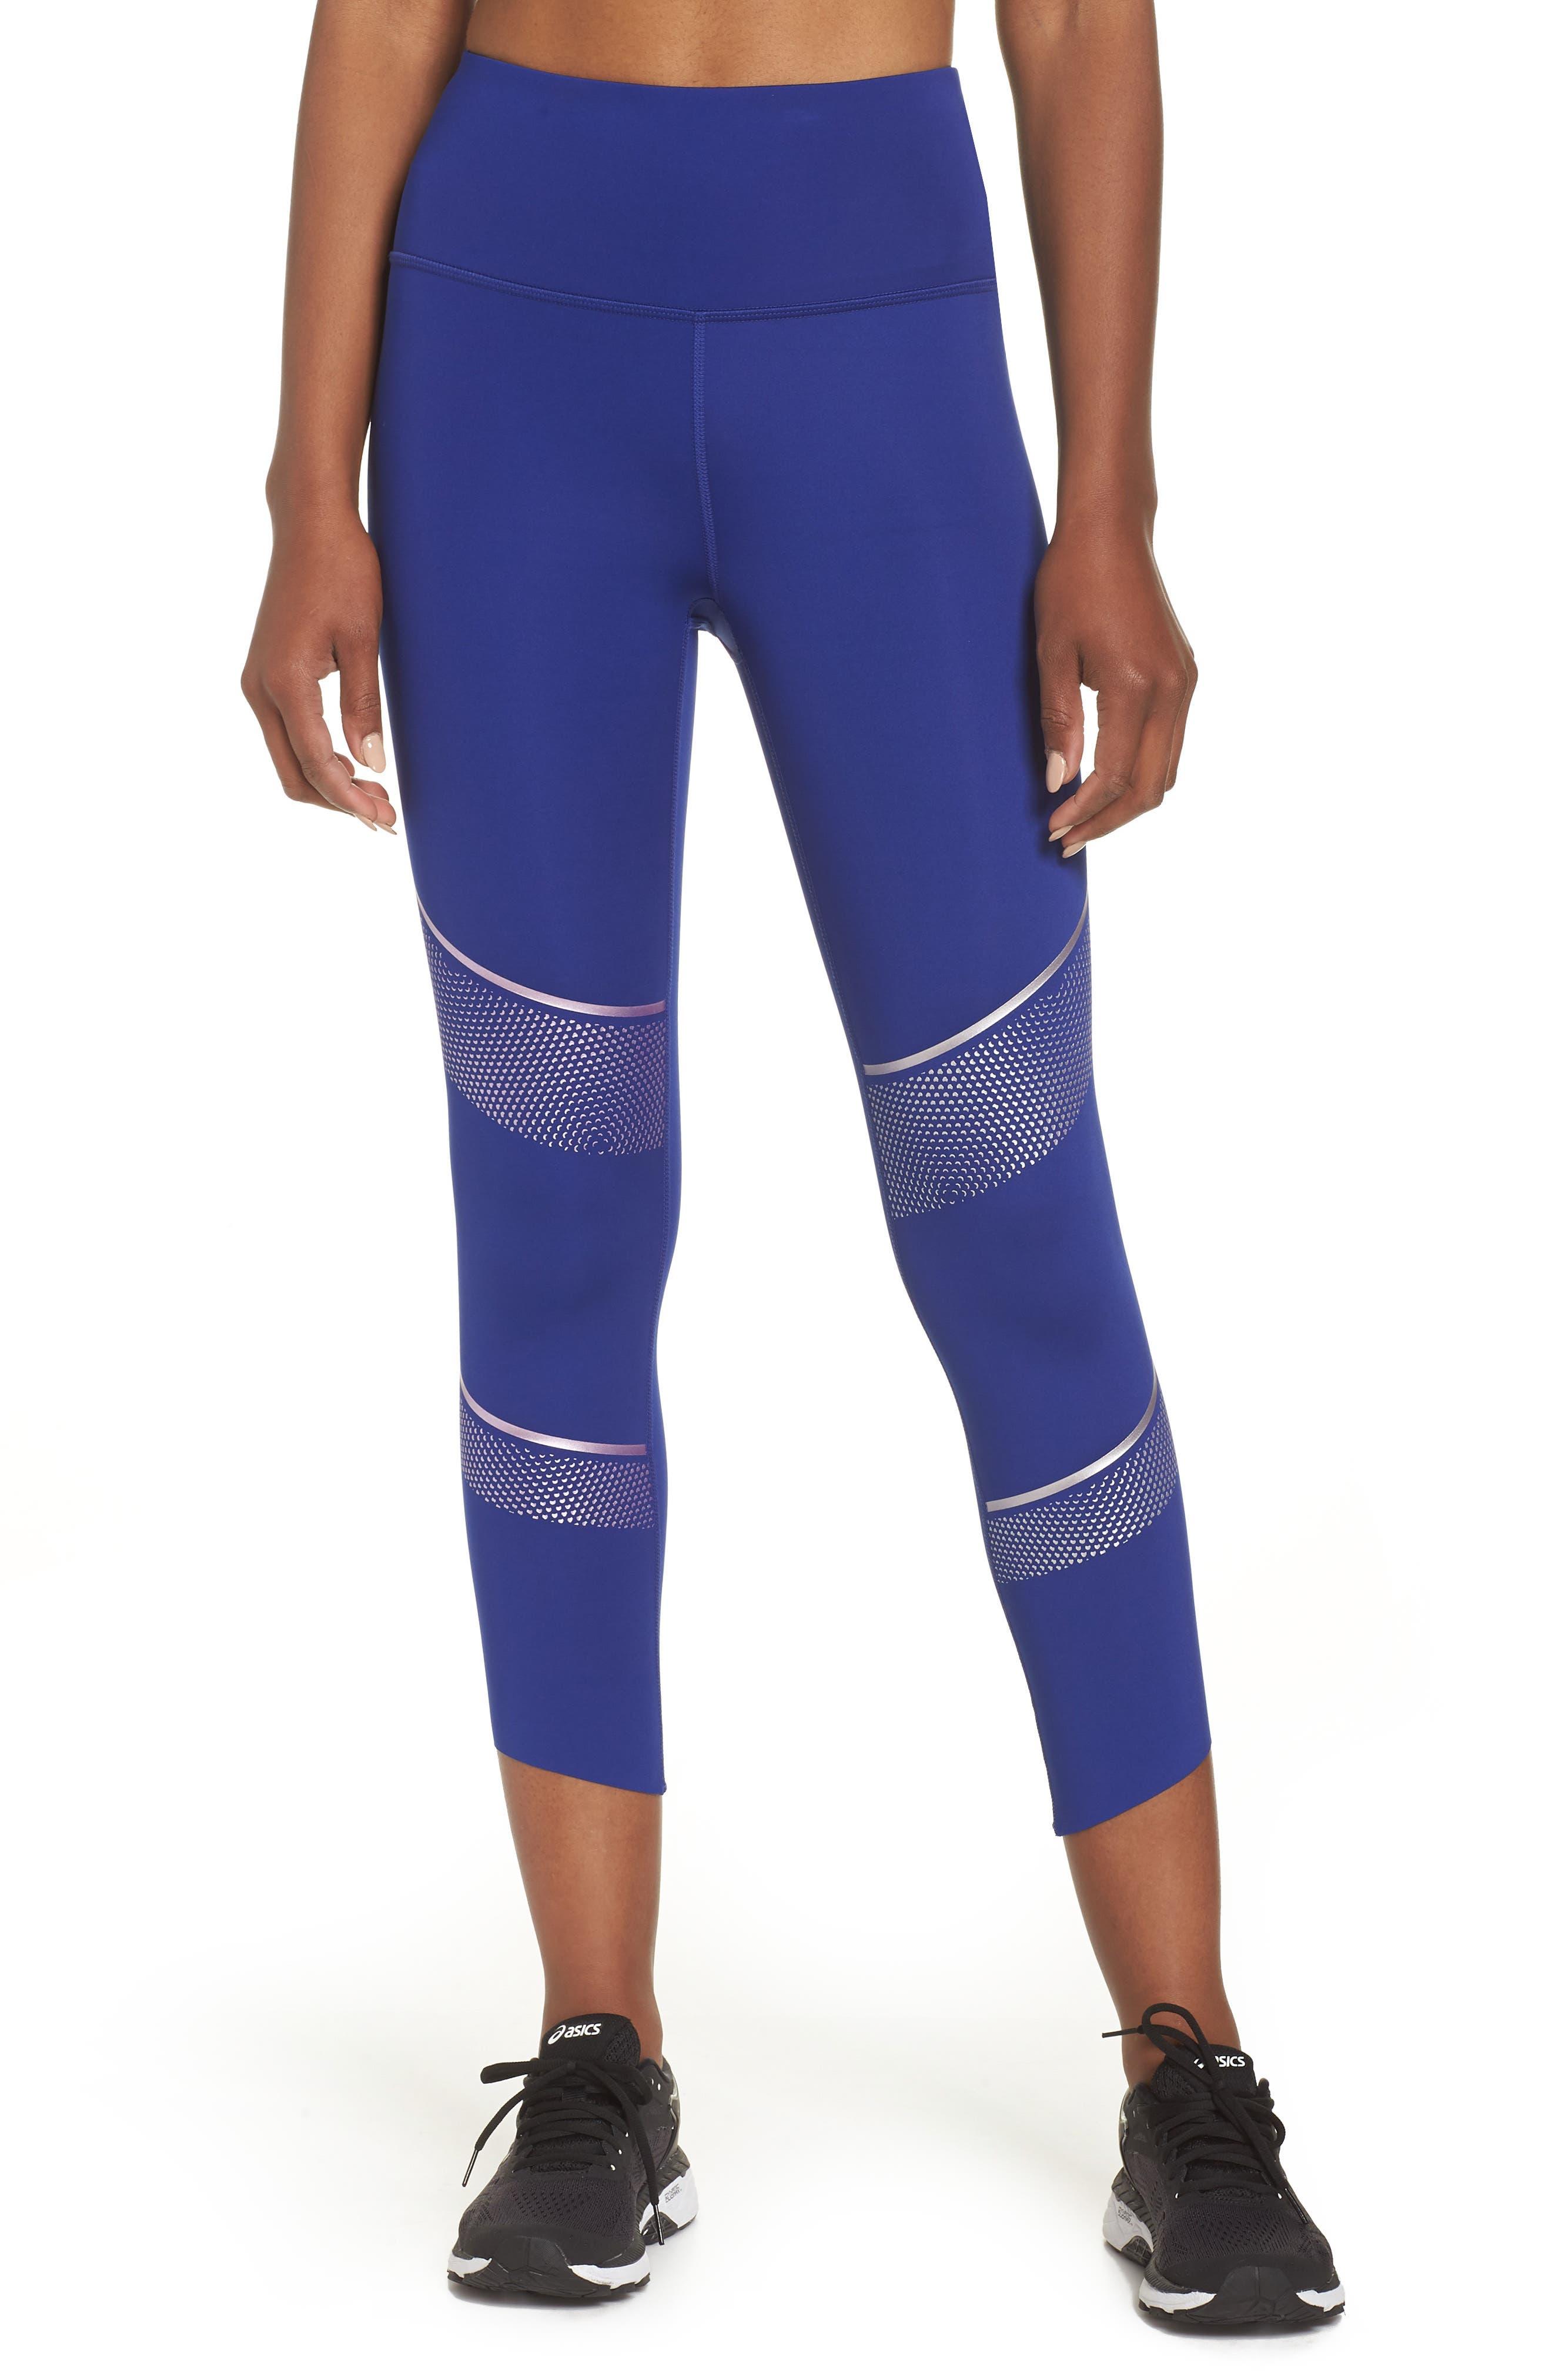 Breathelux Metallic Crop Studio Leggings,                         Main,                         color, Formation Blue